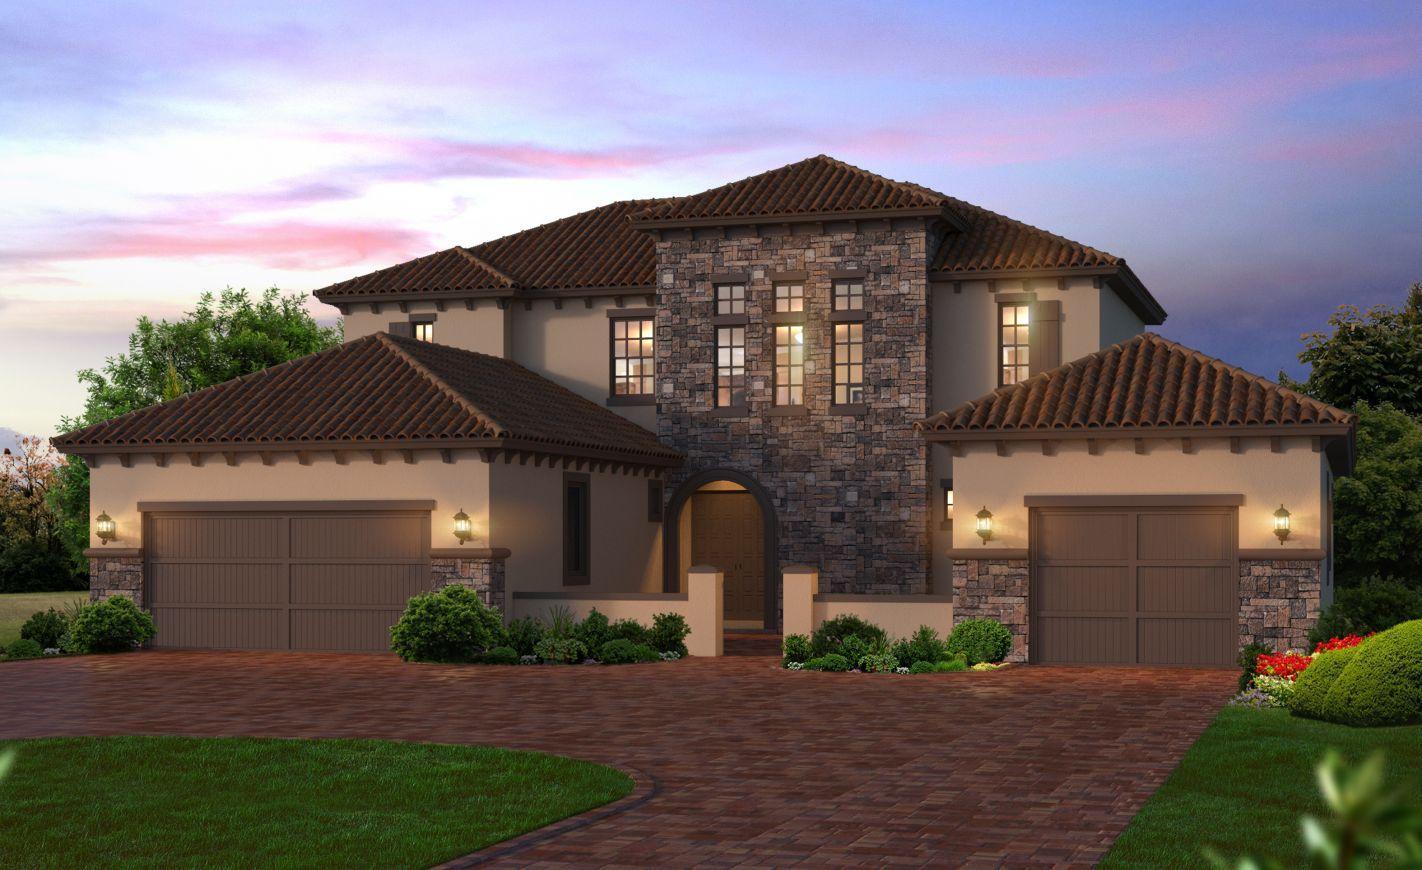 Single Family for Sale at Browns Landing - Marsala 1811 Deen's Creek Lane Port Orange, Florida 32128 United States